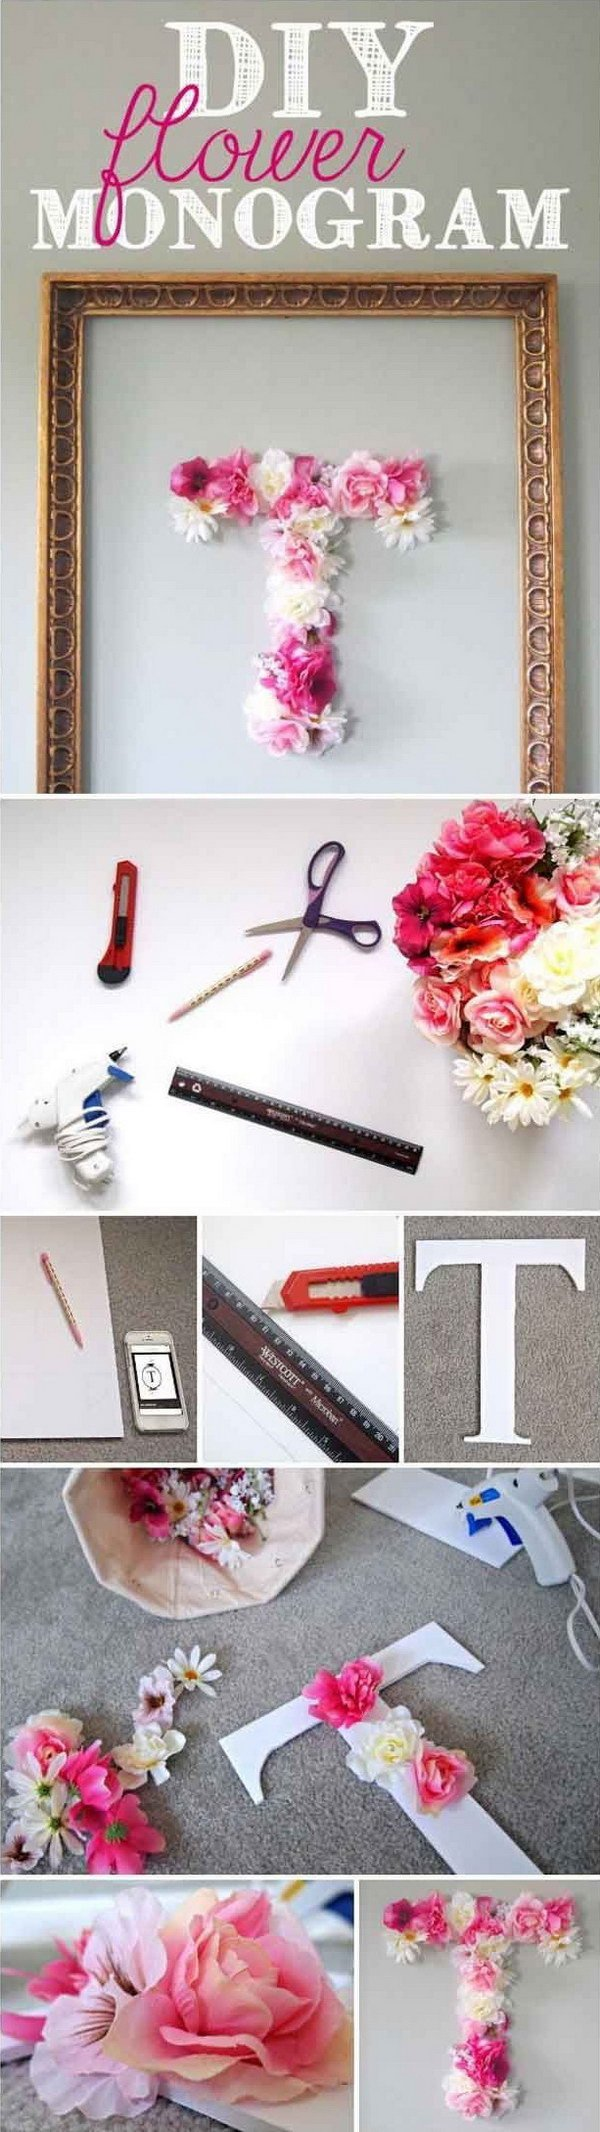 Diy Decor Ideas for Bedroom Elegant 25 Diy Ideas & Tutorials for Teenage Girl S Room Decoration 2017